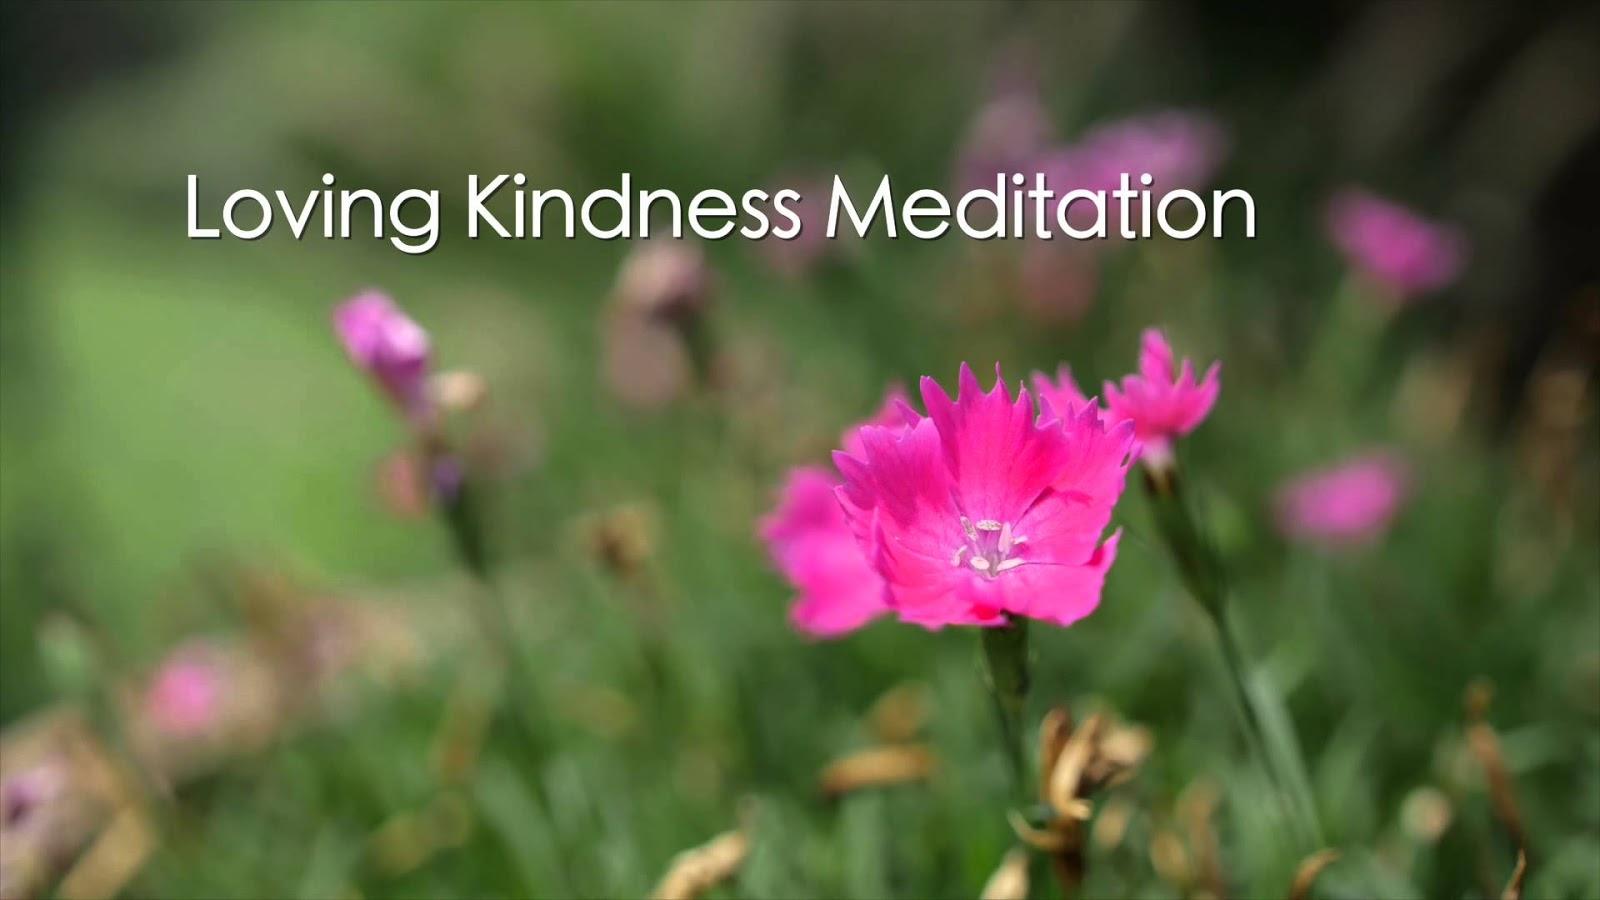 Loving Kindness Quotes Loving Kindness Meditation  Metta Meditation  Quotes India